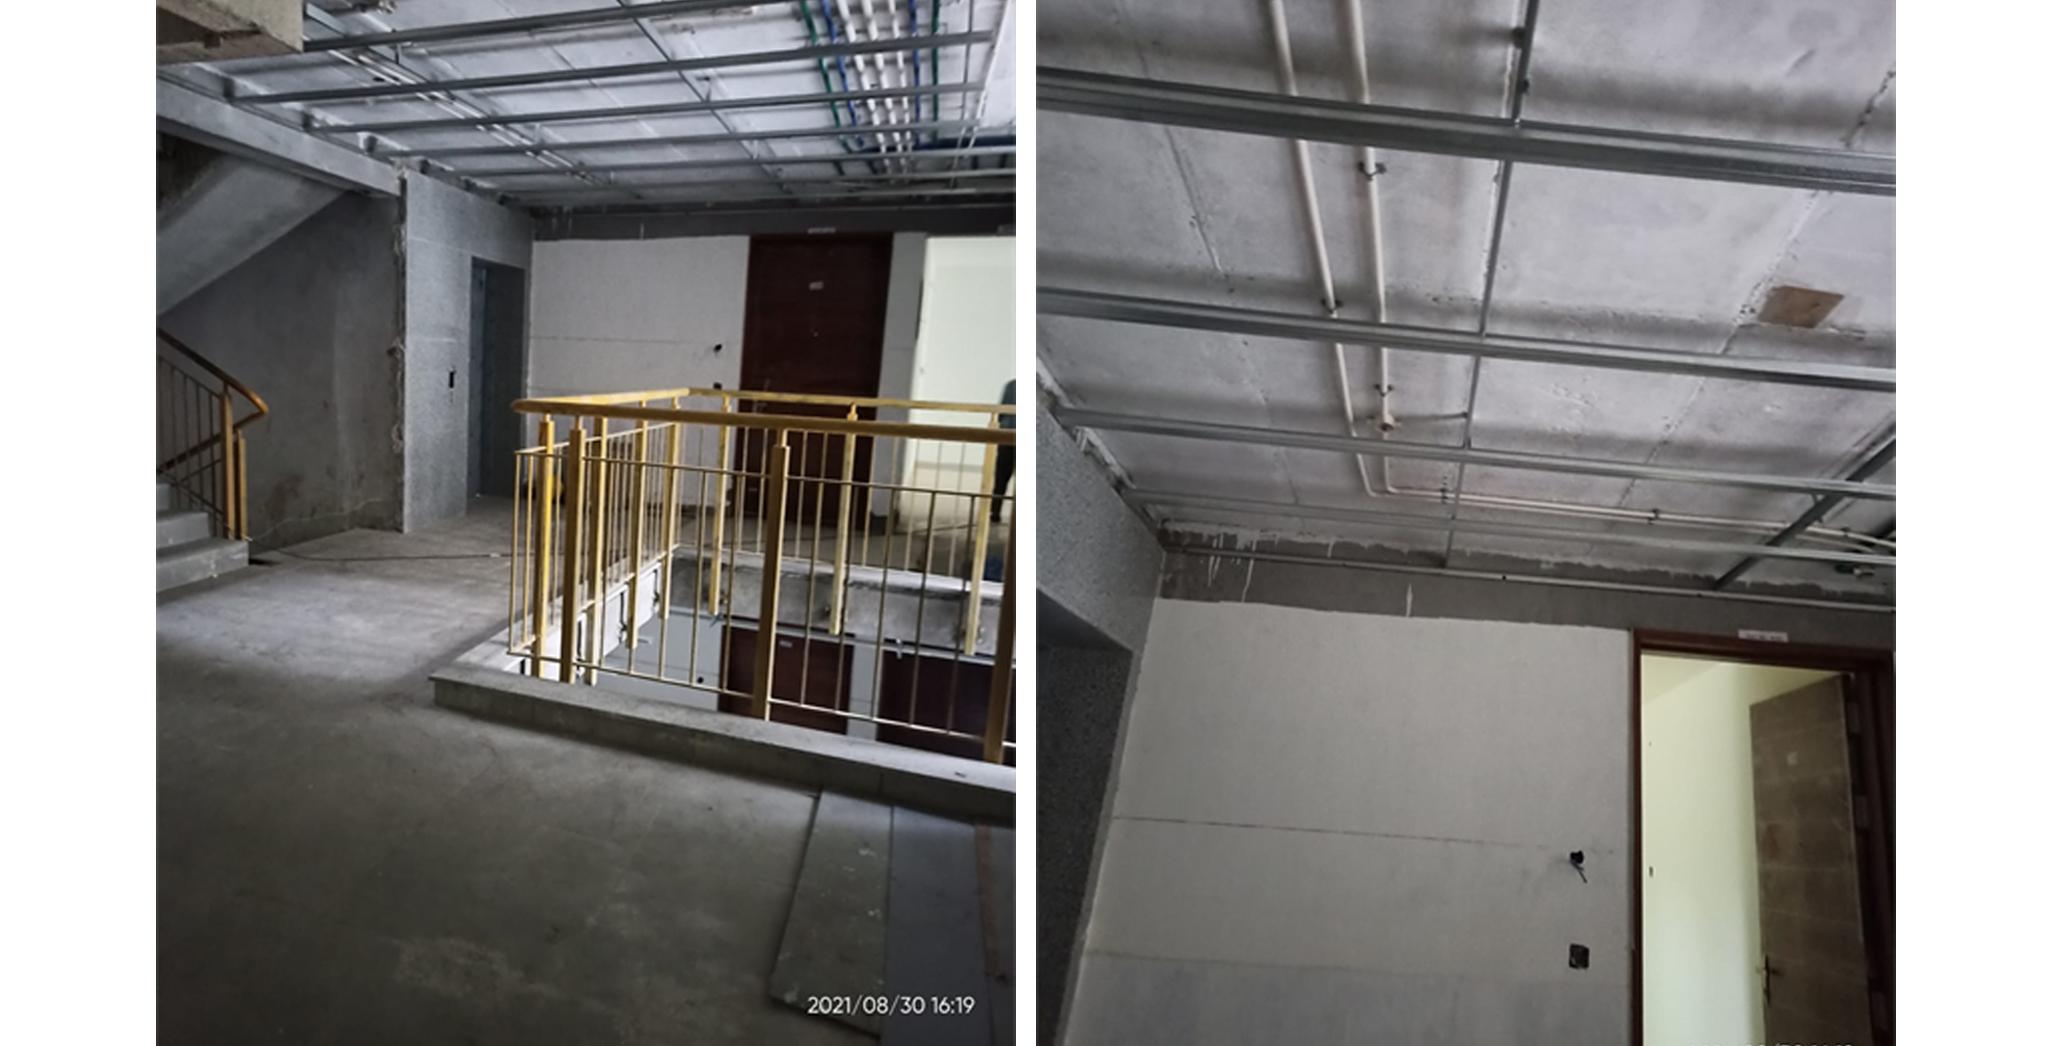 Aug 2021 - A Block: Ground floor lobby flooring completed. Ground floor lobby false ceiling work in progress